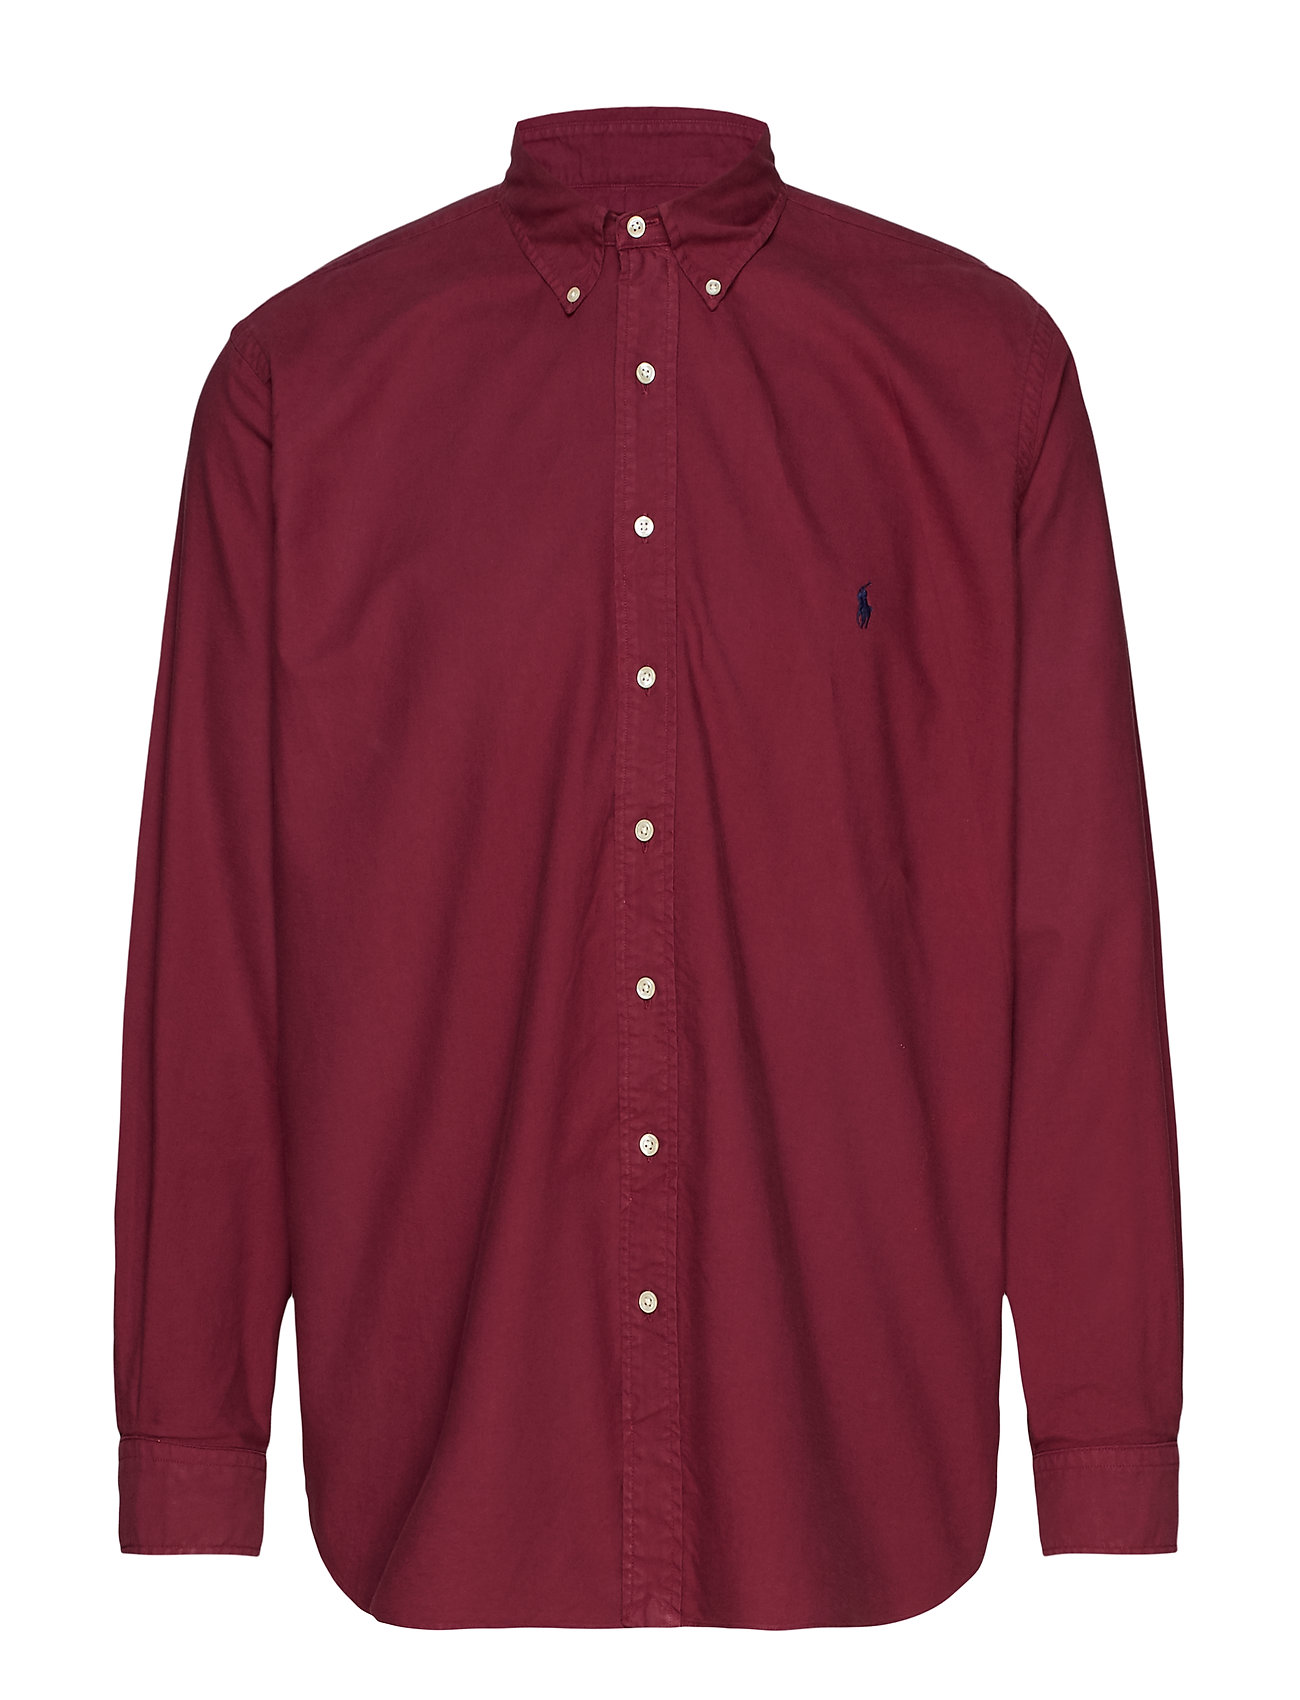 Polo Ralph Lauren Big & Tall Classic Fit Oxford Shirt - AUBERGINE